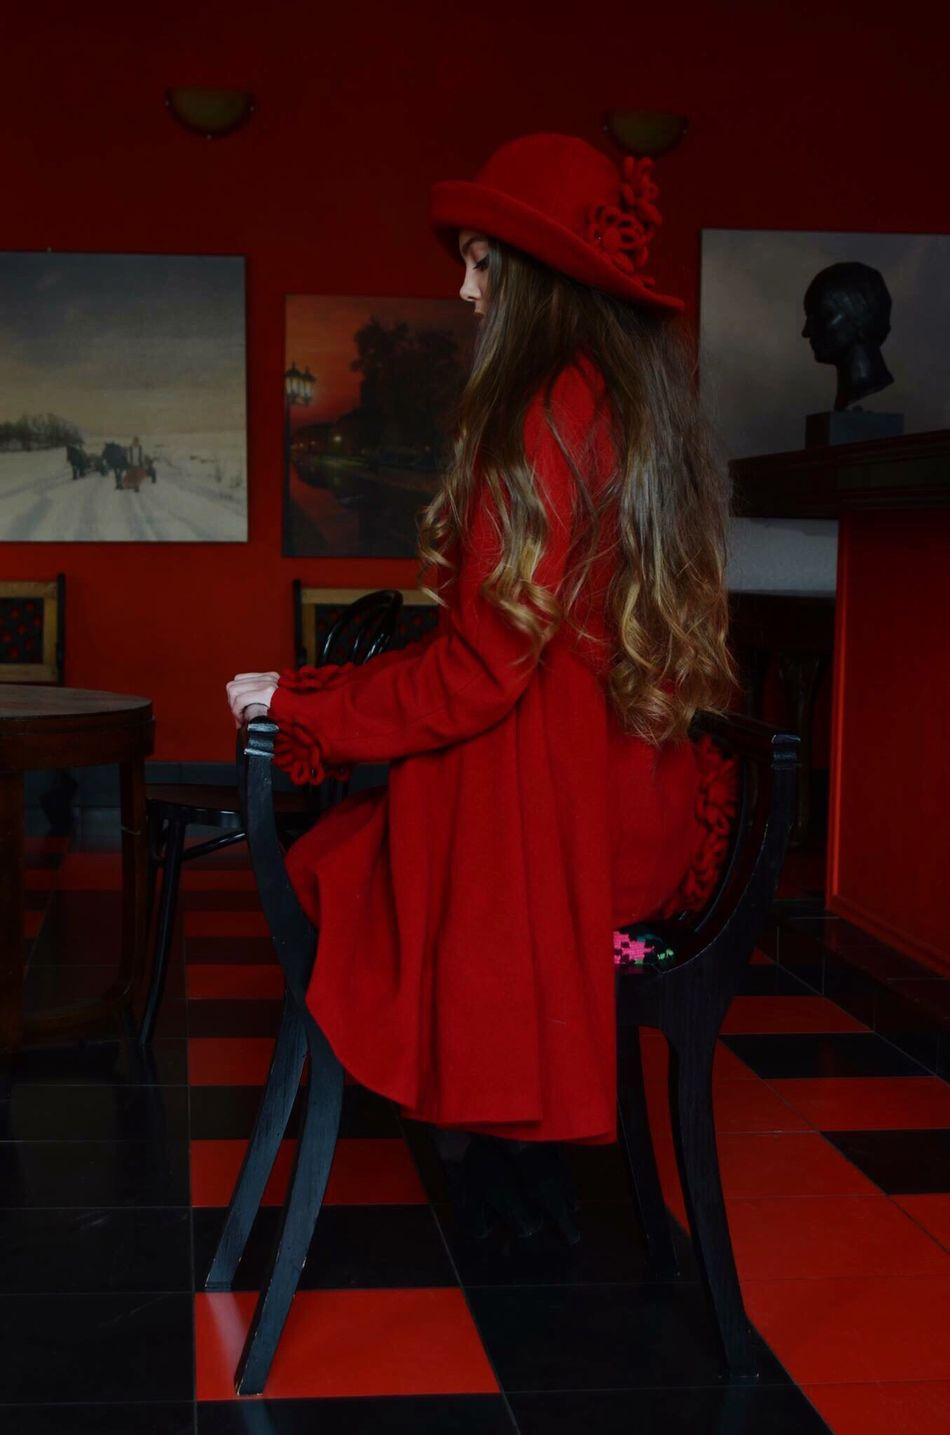 Adinafrasinphotography Photography Photoshoot Beautiful Model Fashion Photography Modeling Girlmodel Red Fashion Longhair Curlyhair Beauty